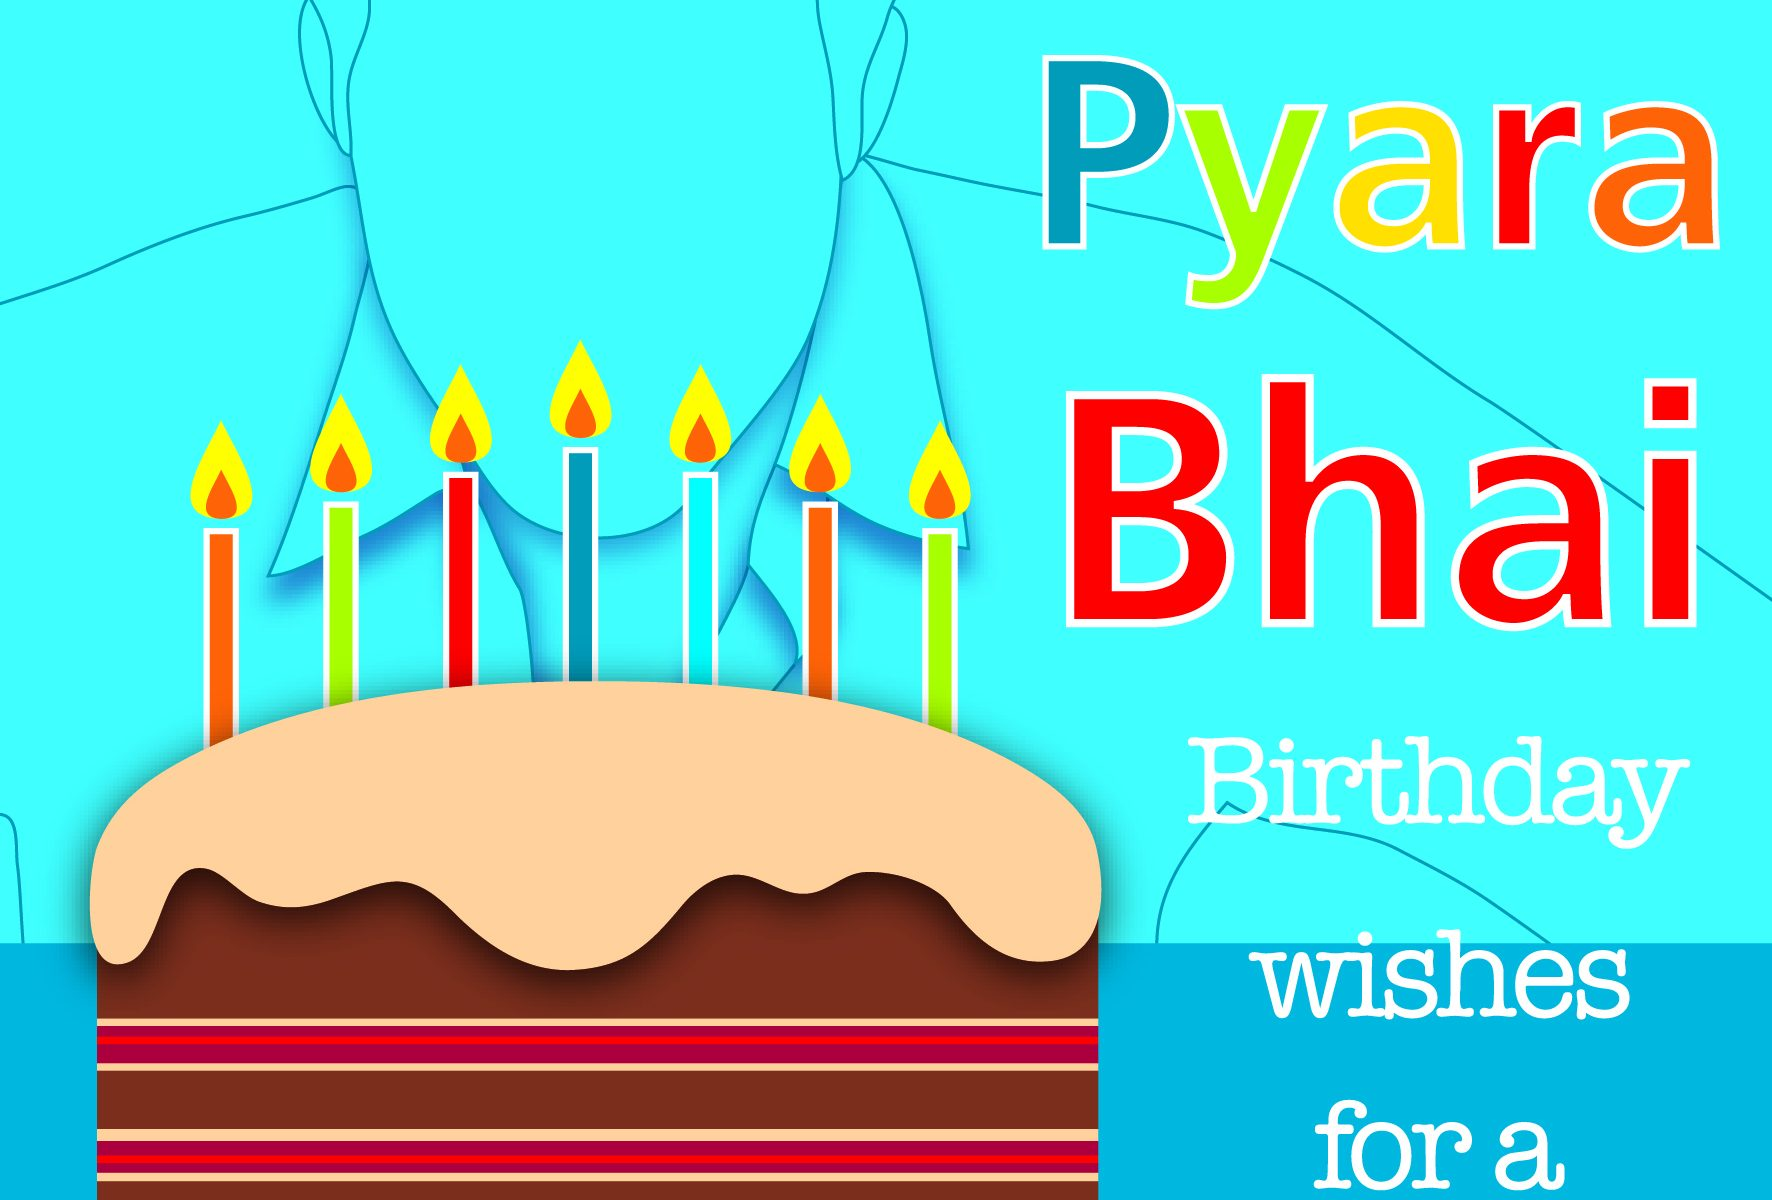 Bhai Birthday Card